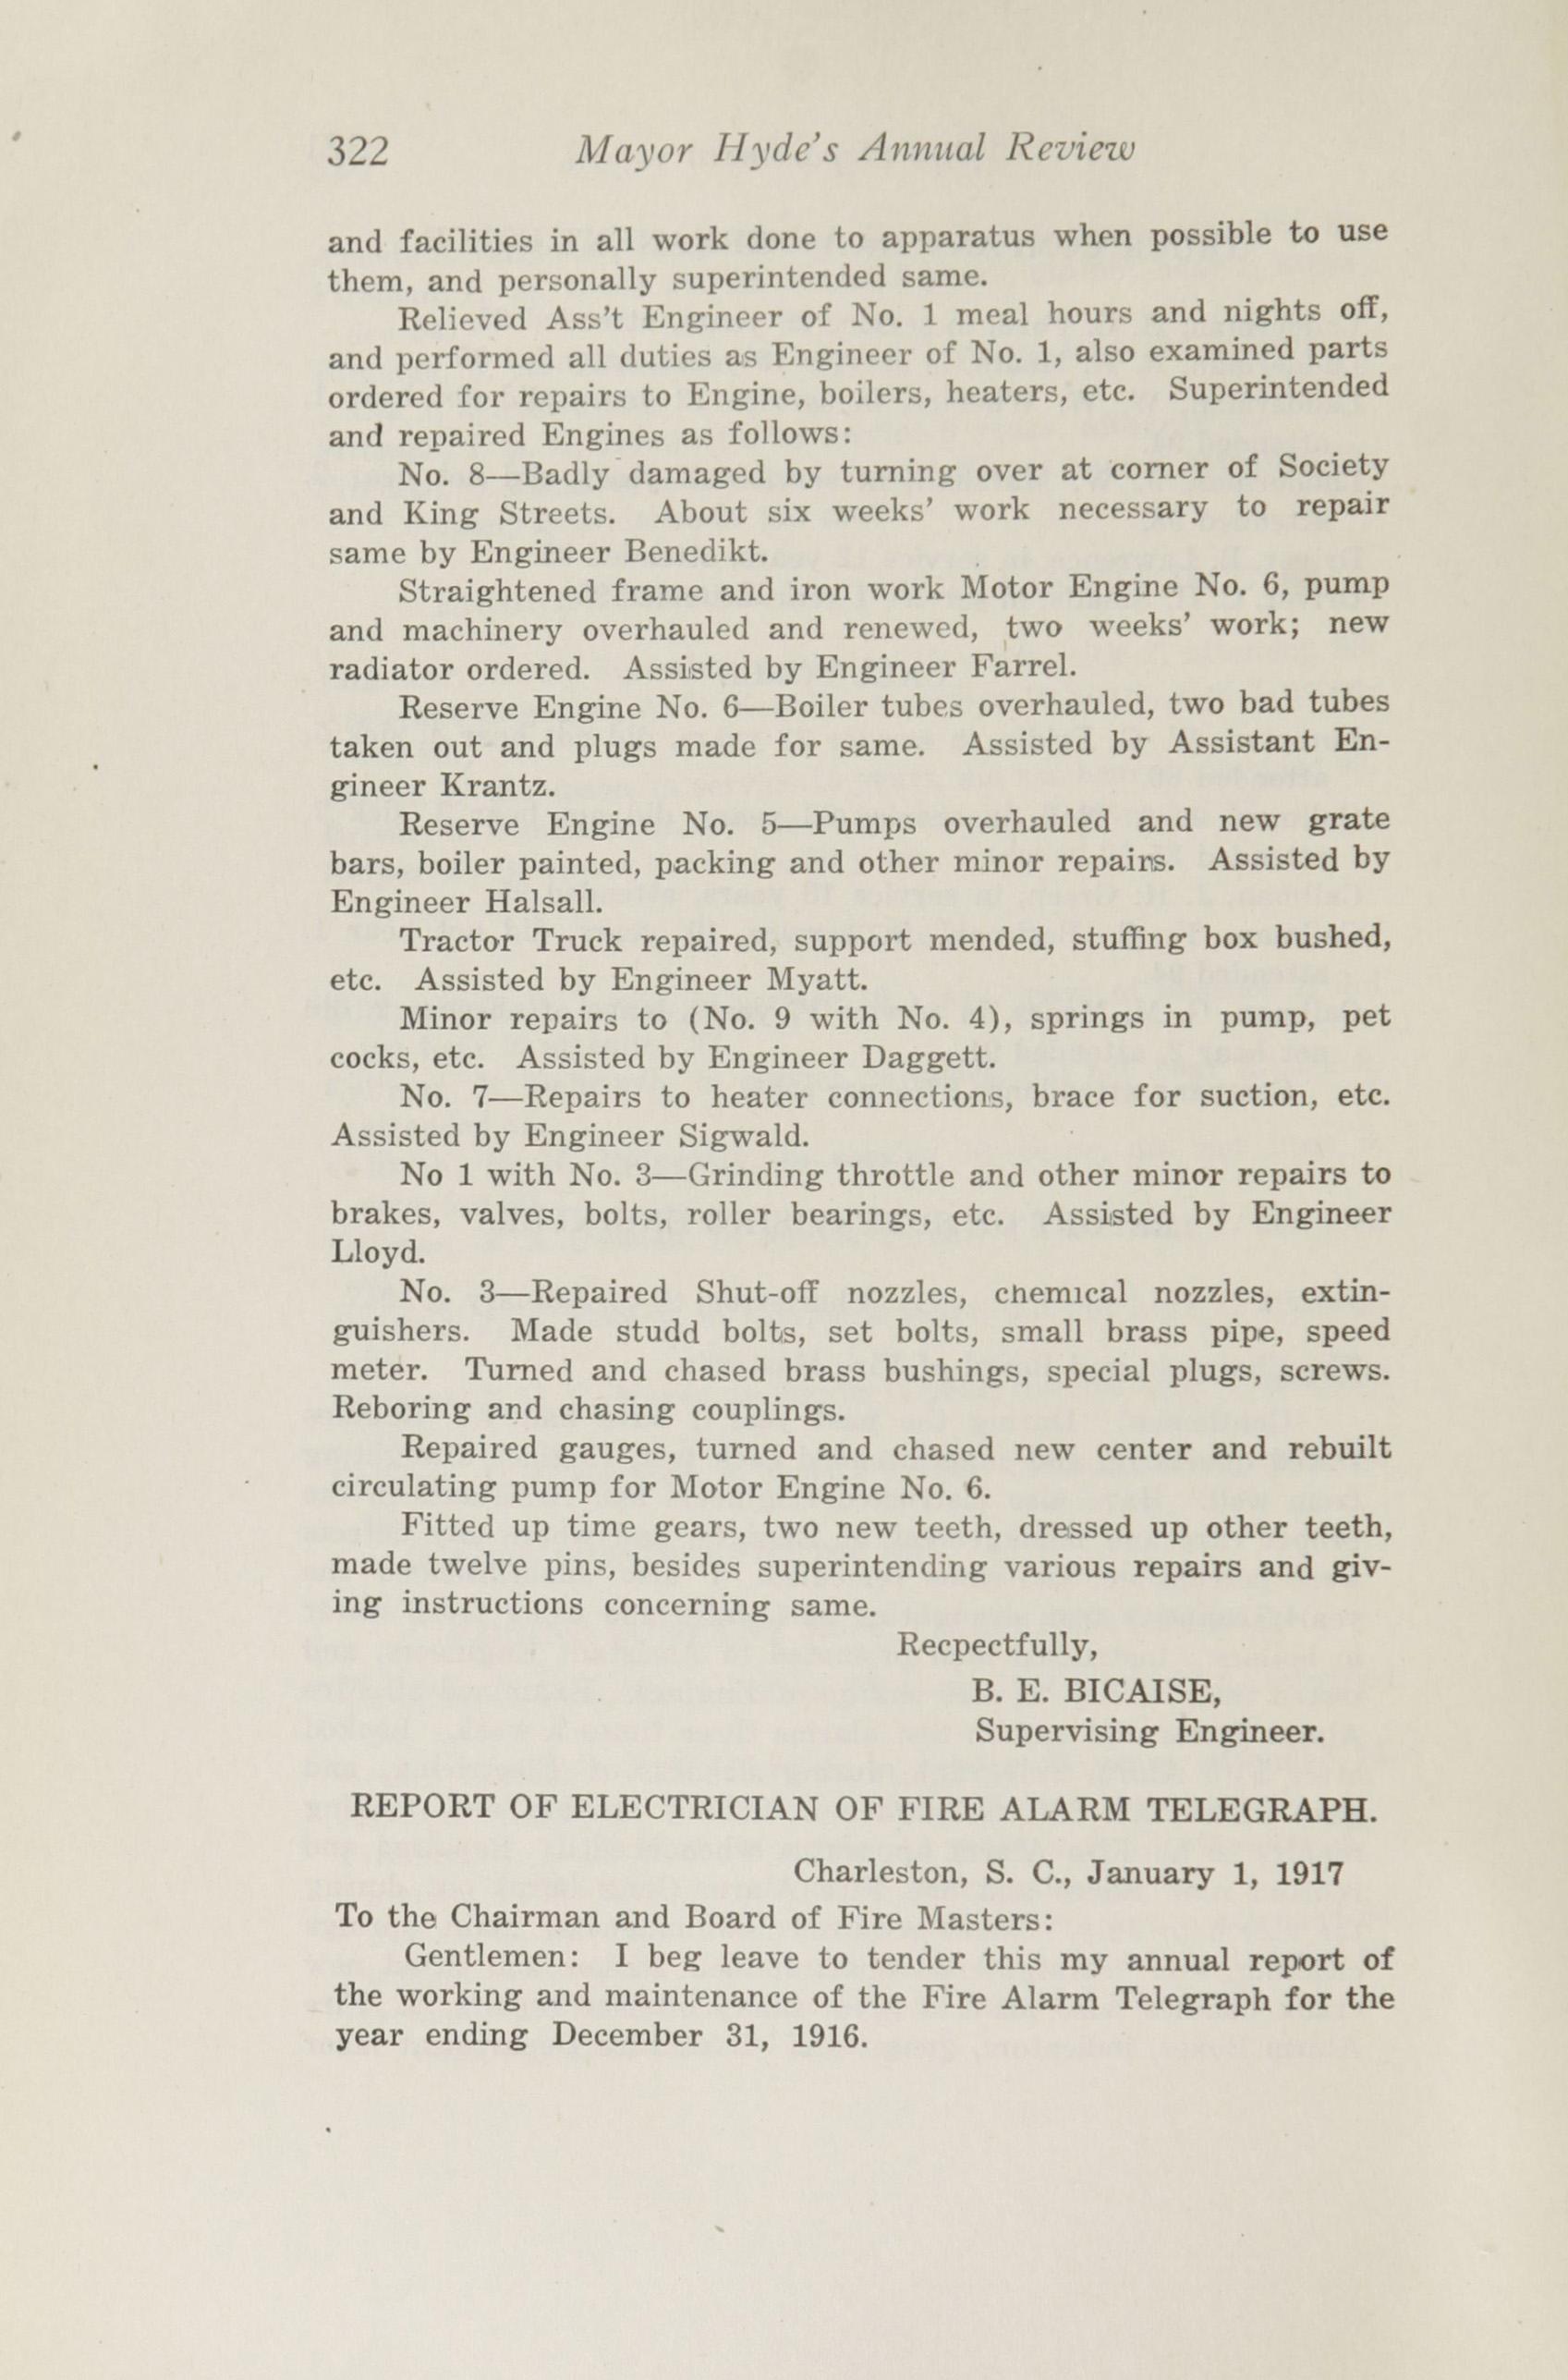 Charleston Yearbook, 1916, page 322